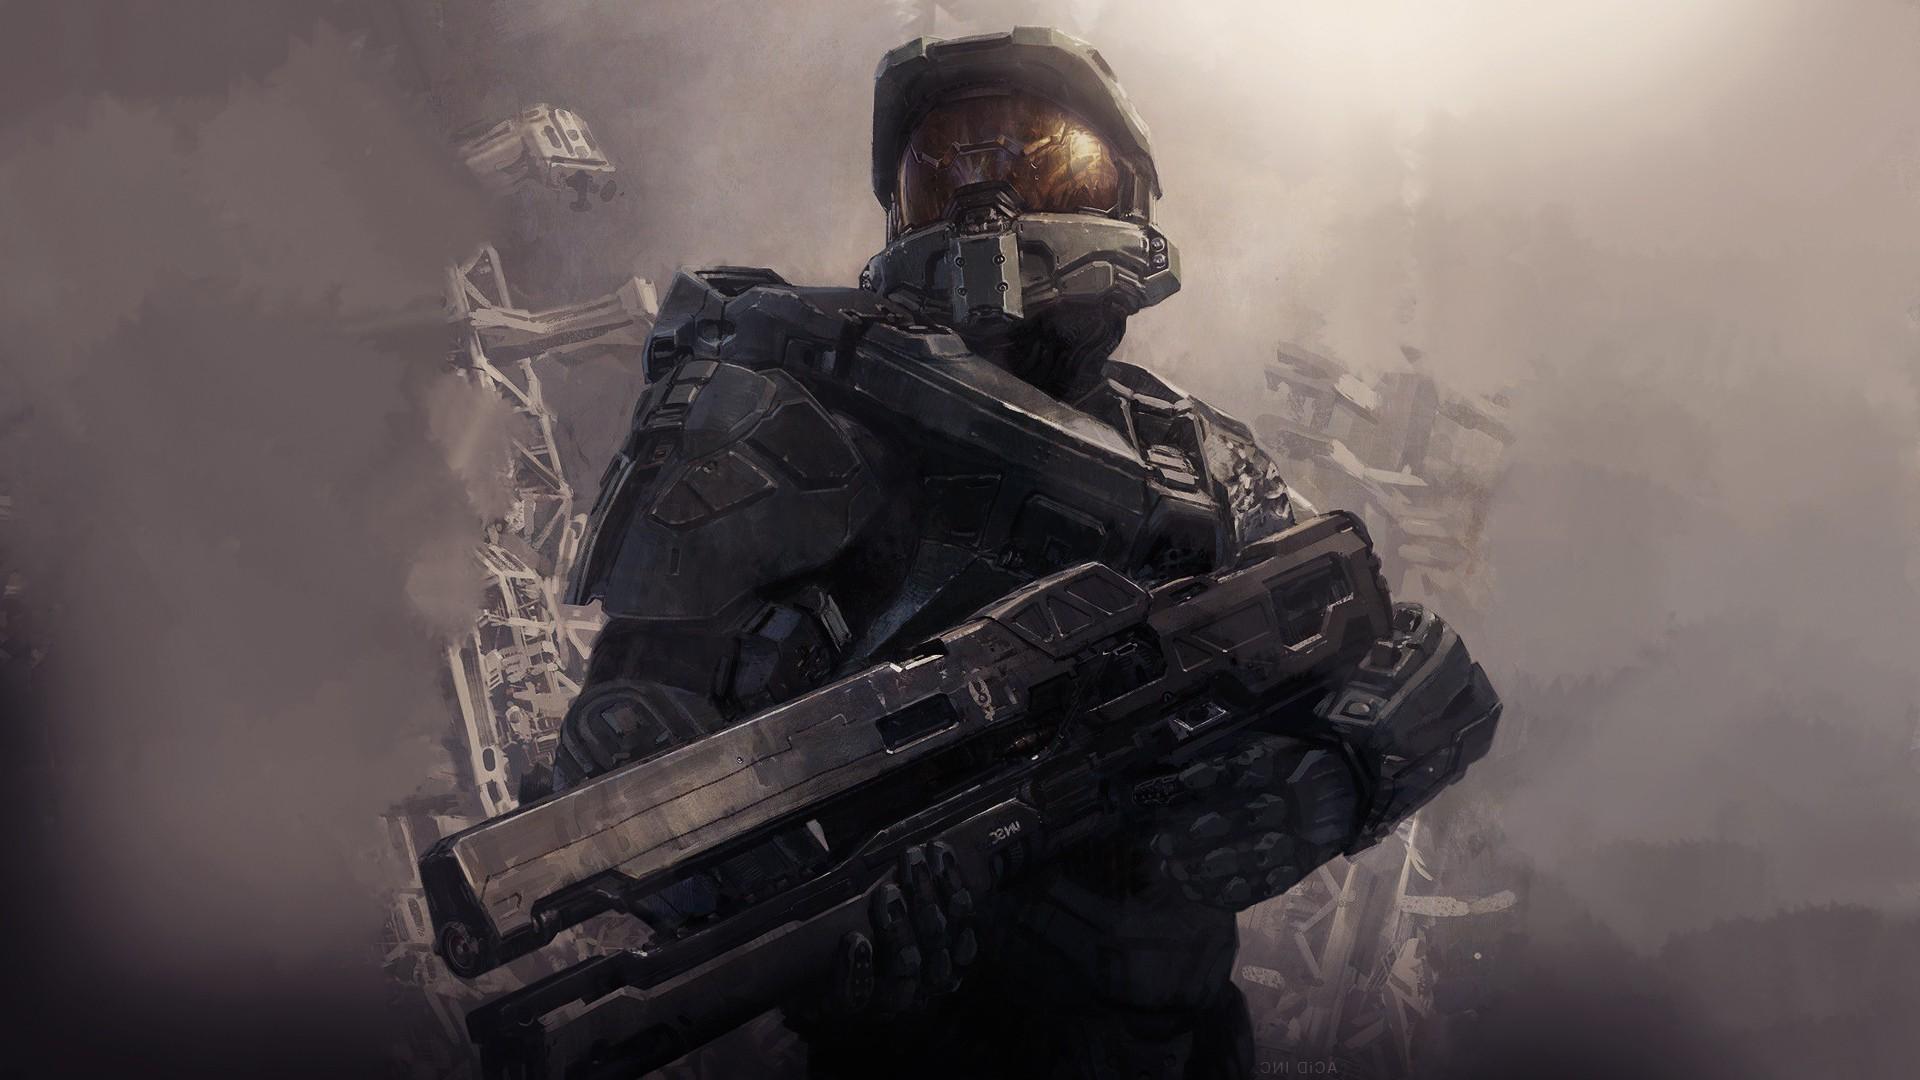 Wallpaper Video Games Artwork Soldier Master Chief